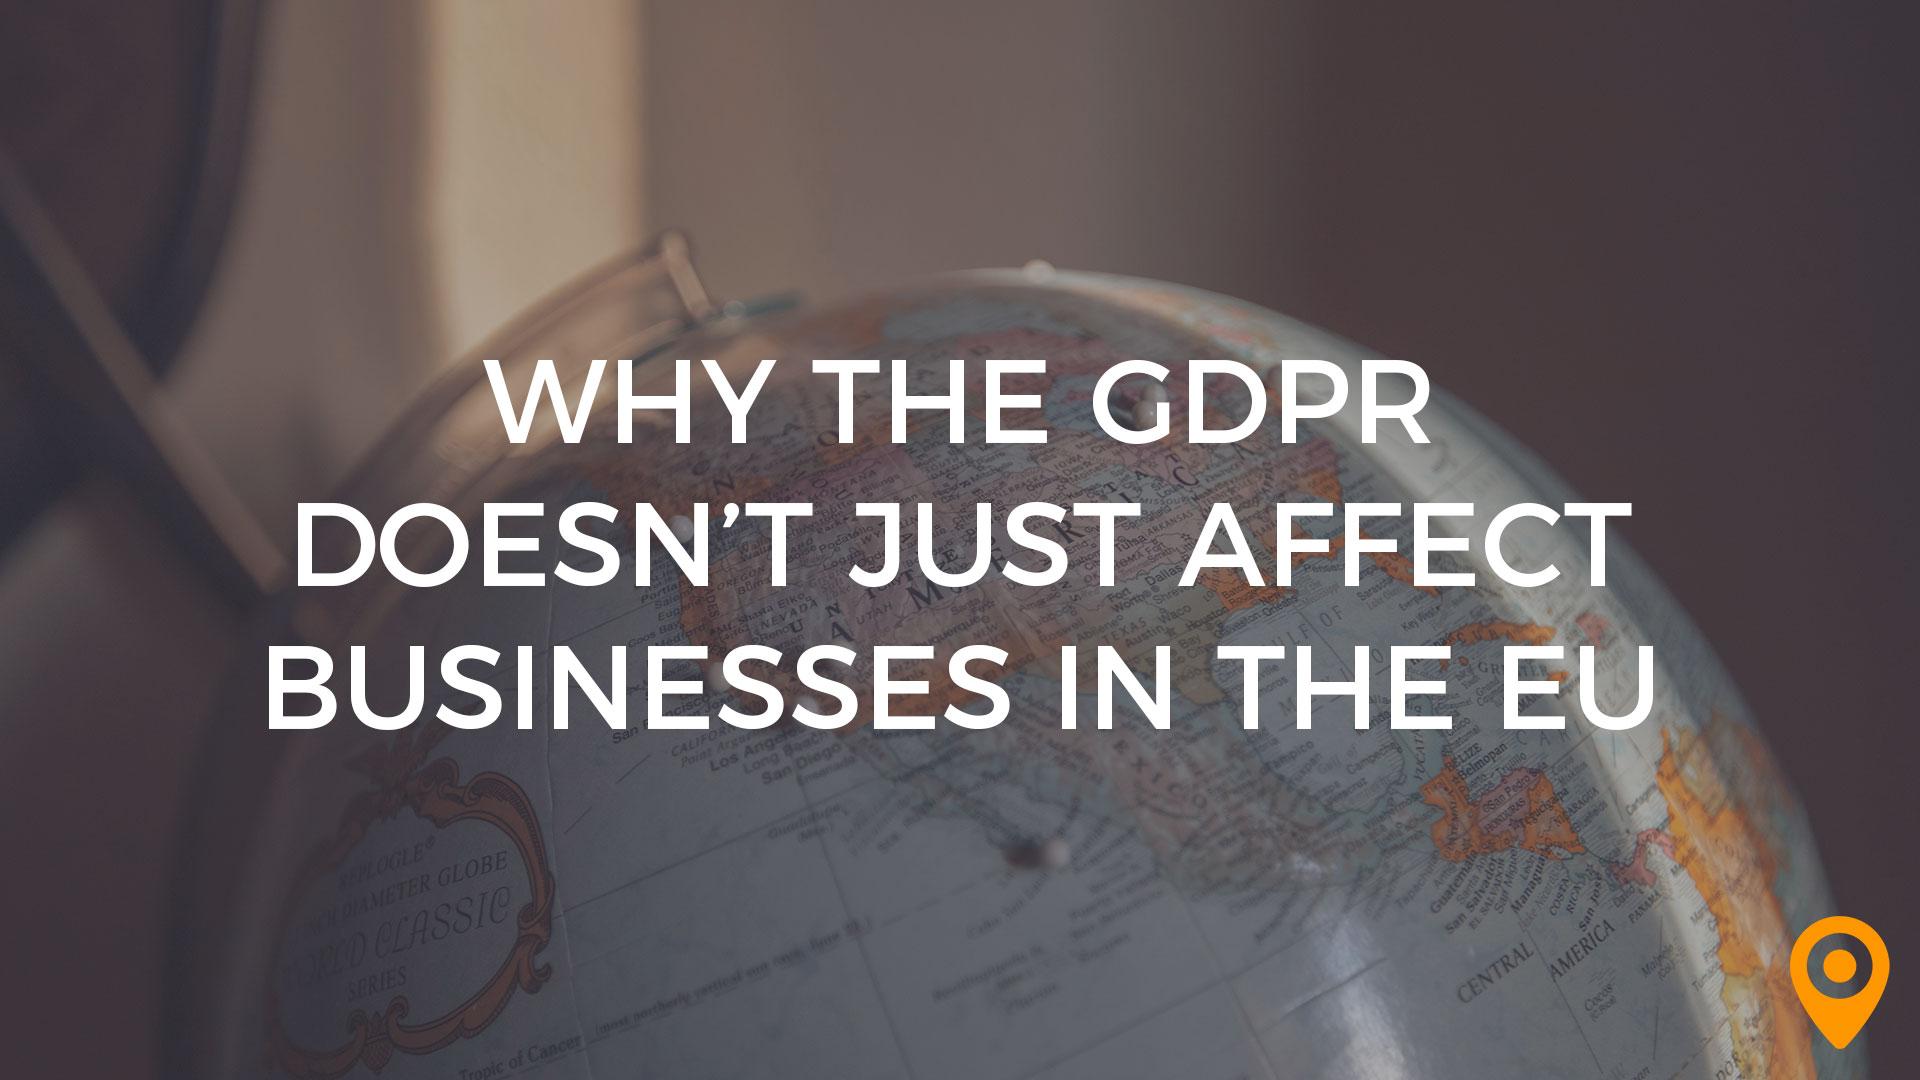 GDPR Impact